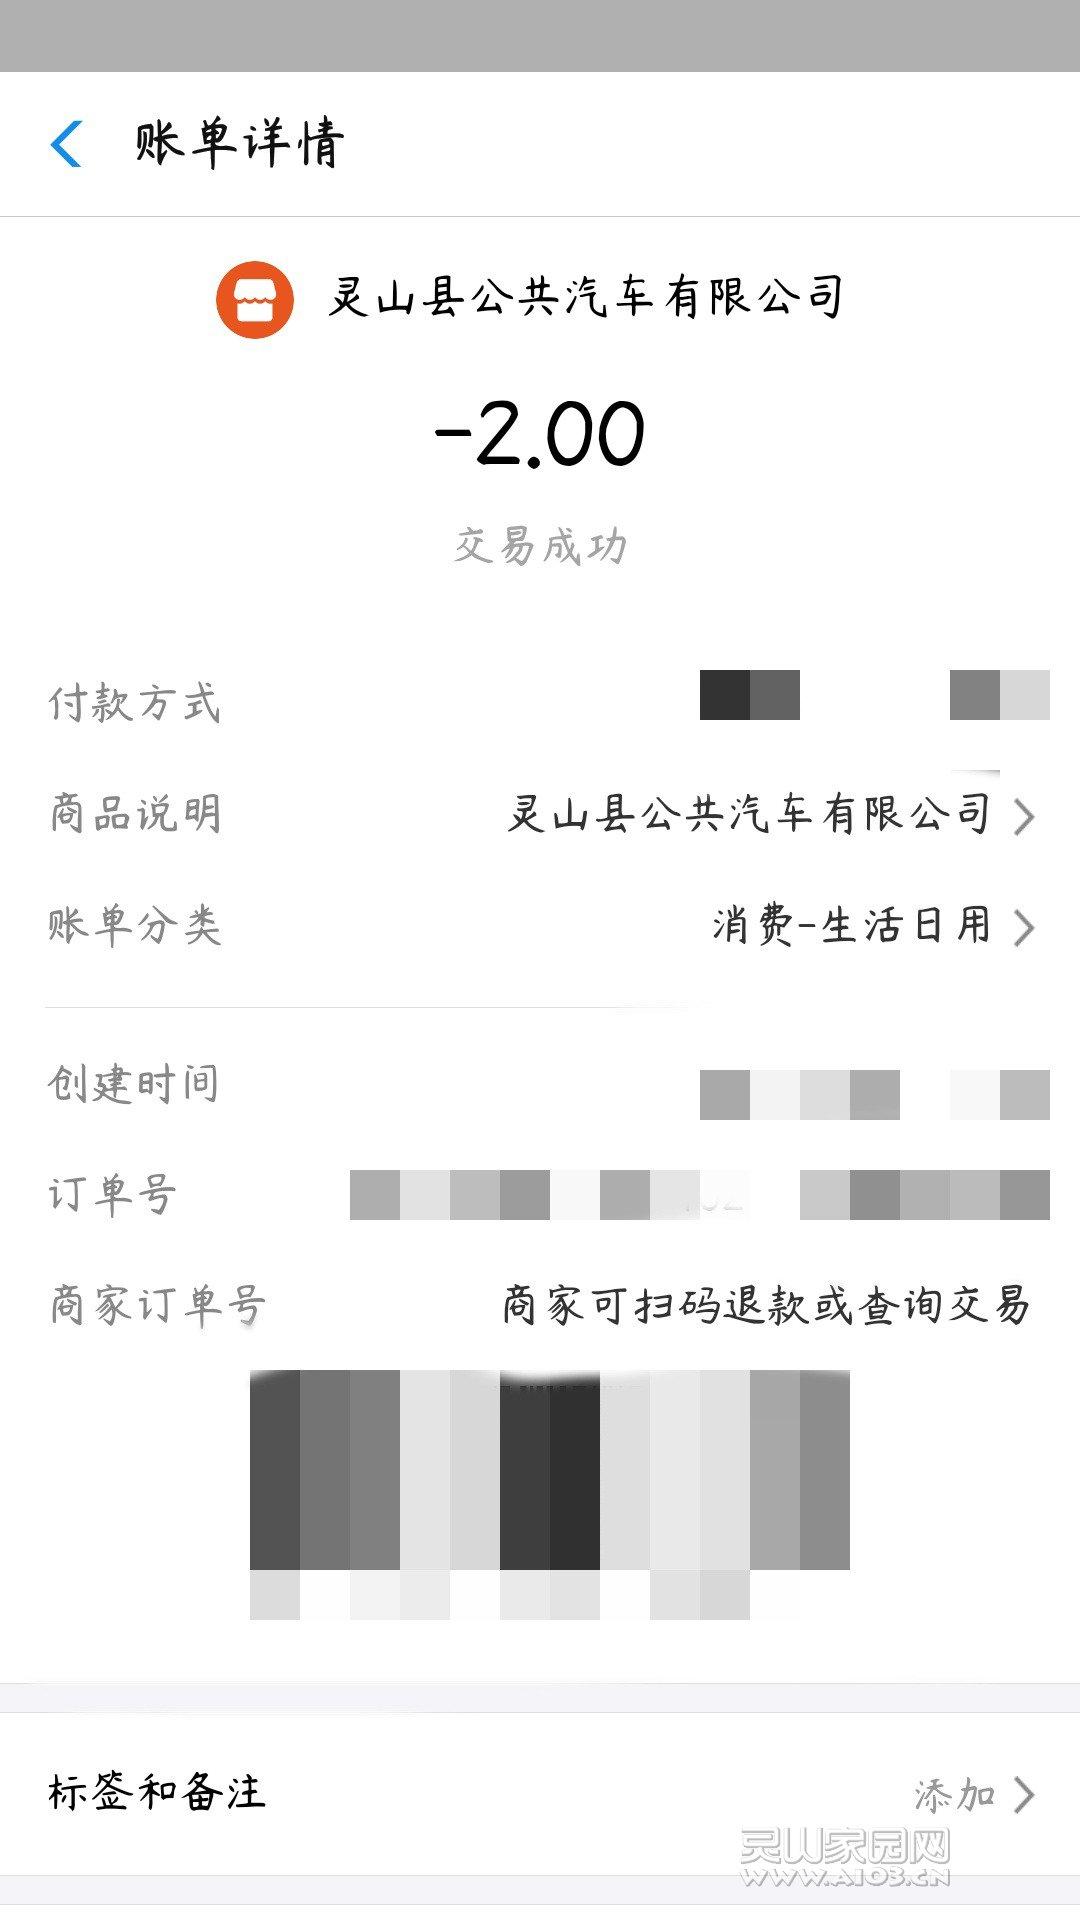 IMG_20190206_151208.jpg